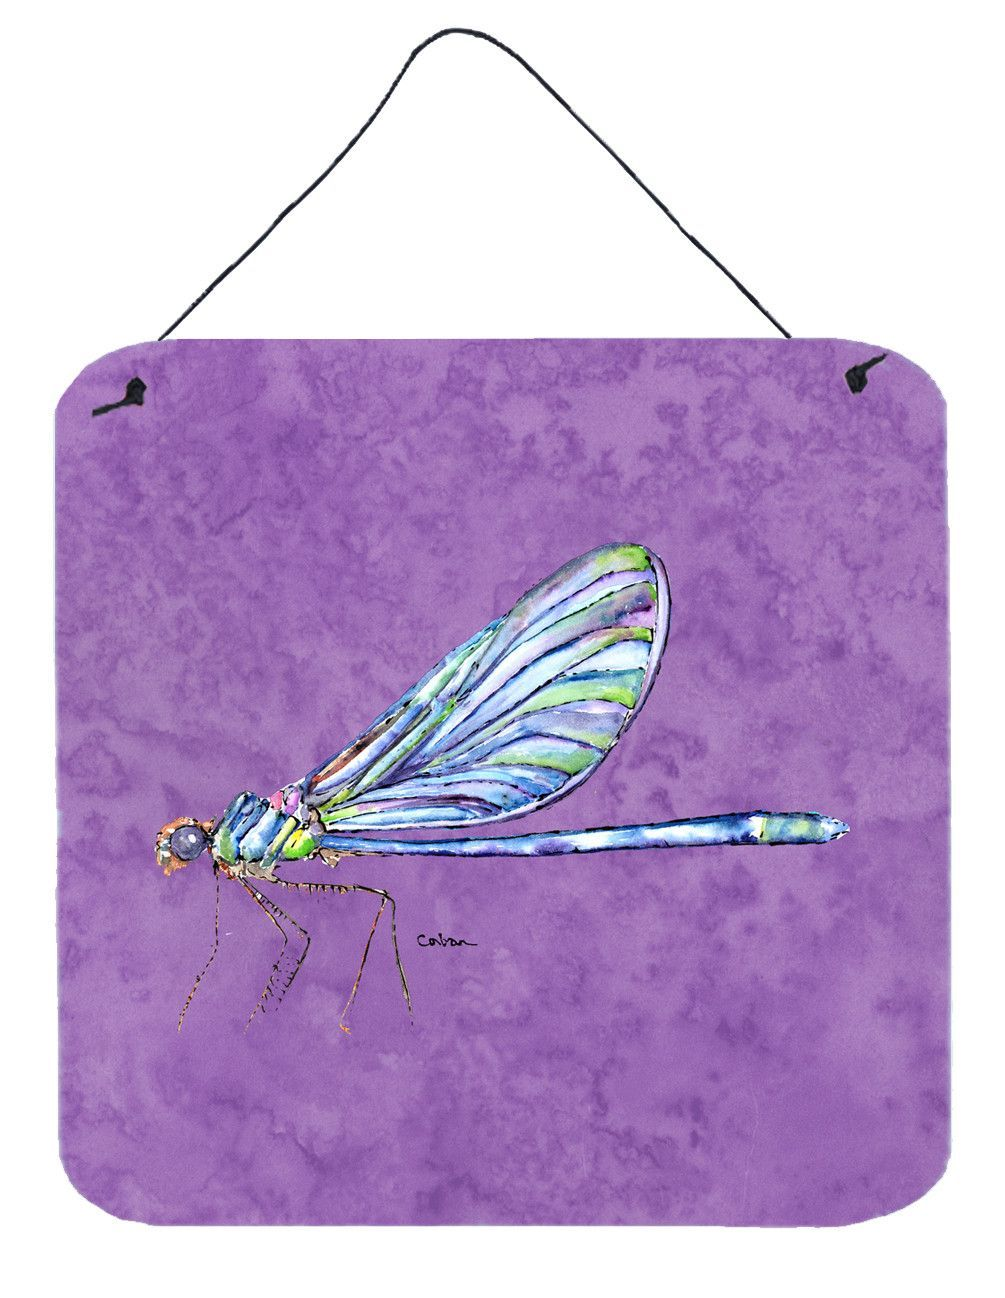 Dragonfly on Purple Aluminium Metal Wall or Door Hanging Prints